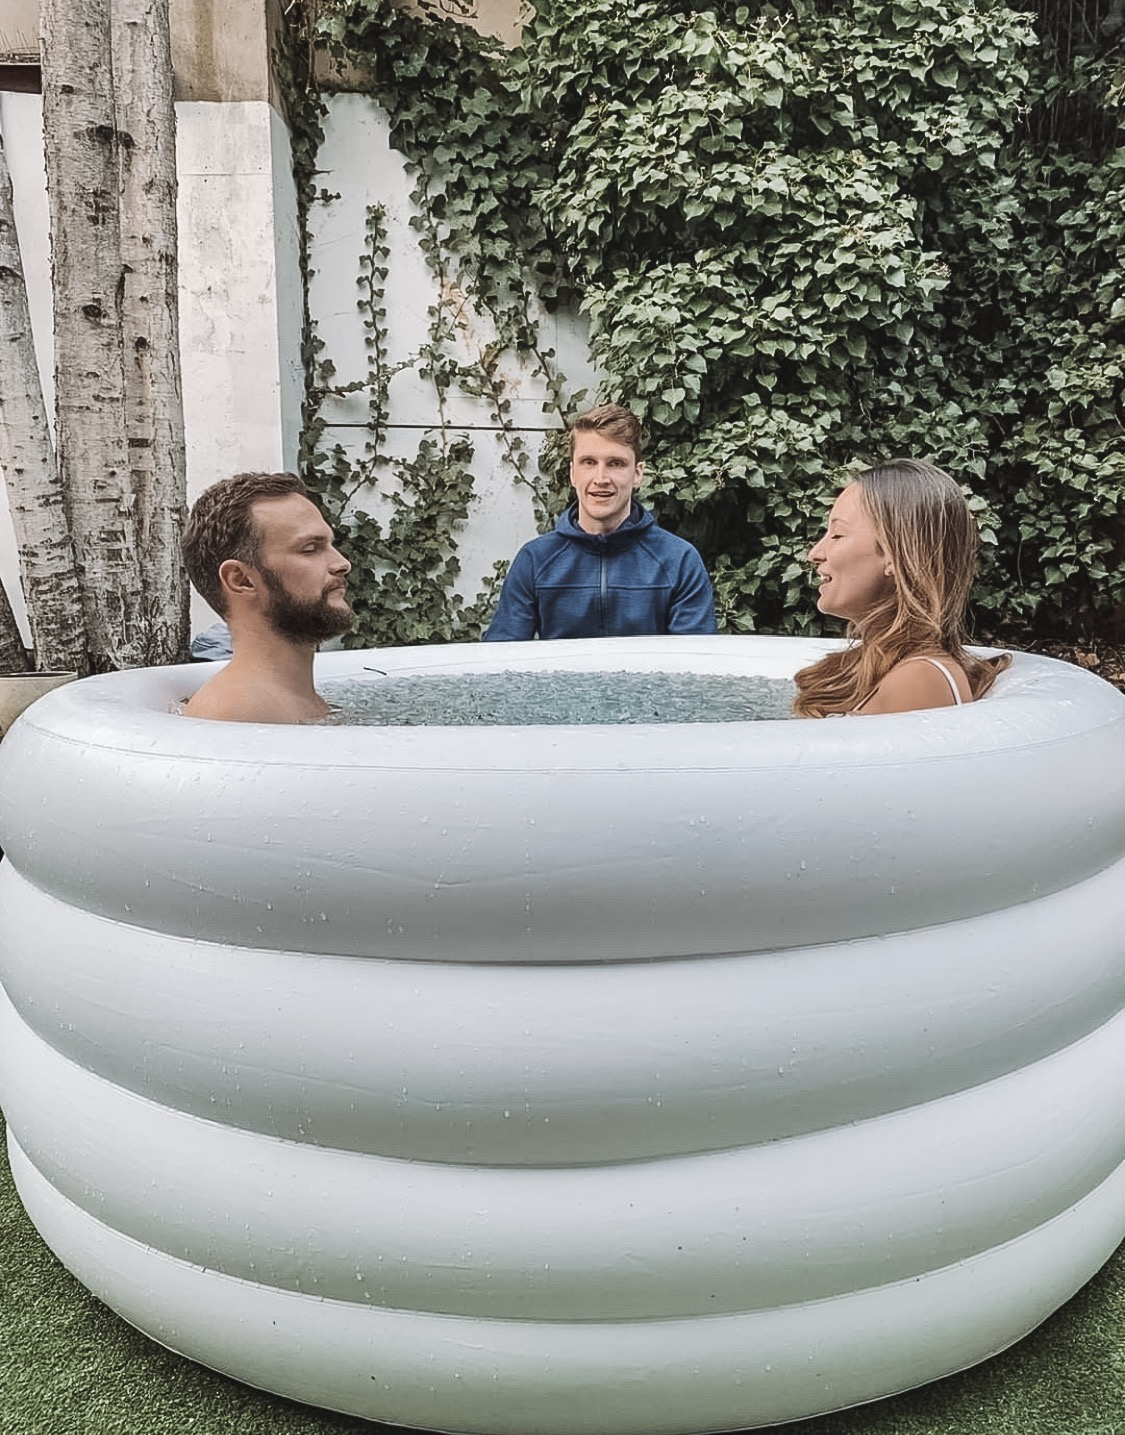 The Wim Hof technique: Breathwork, Movement + Ice Bath